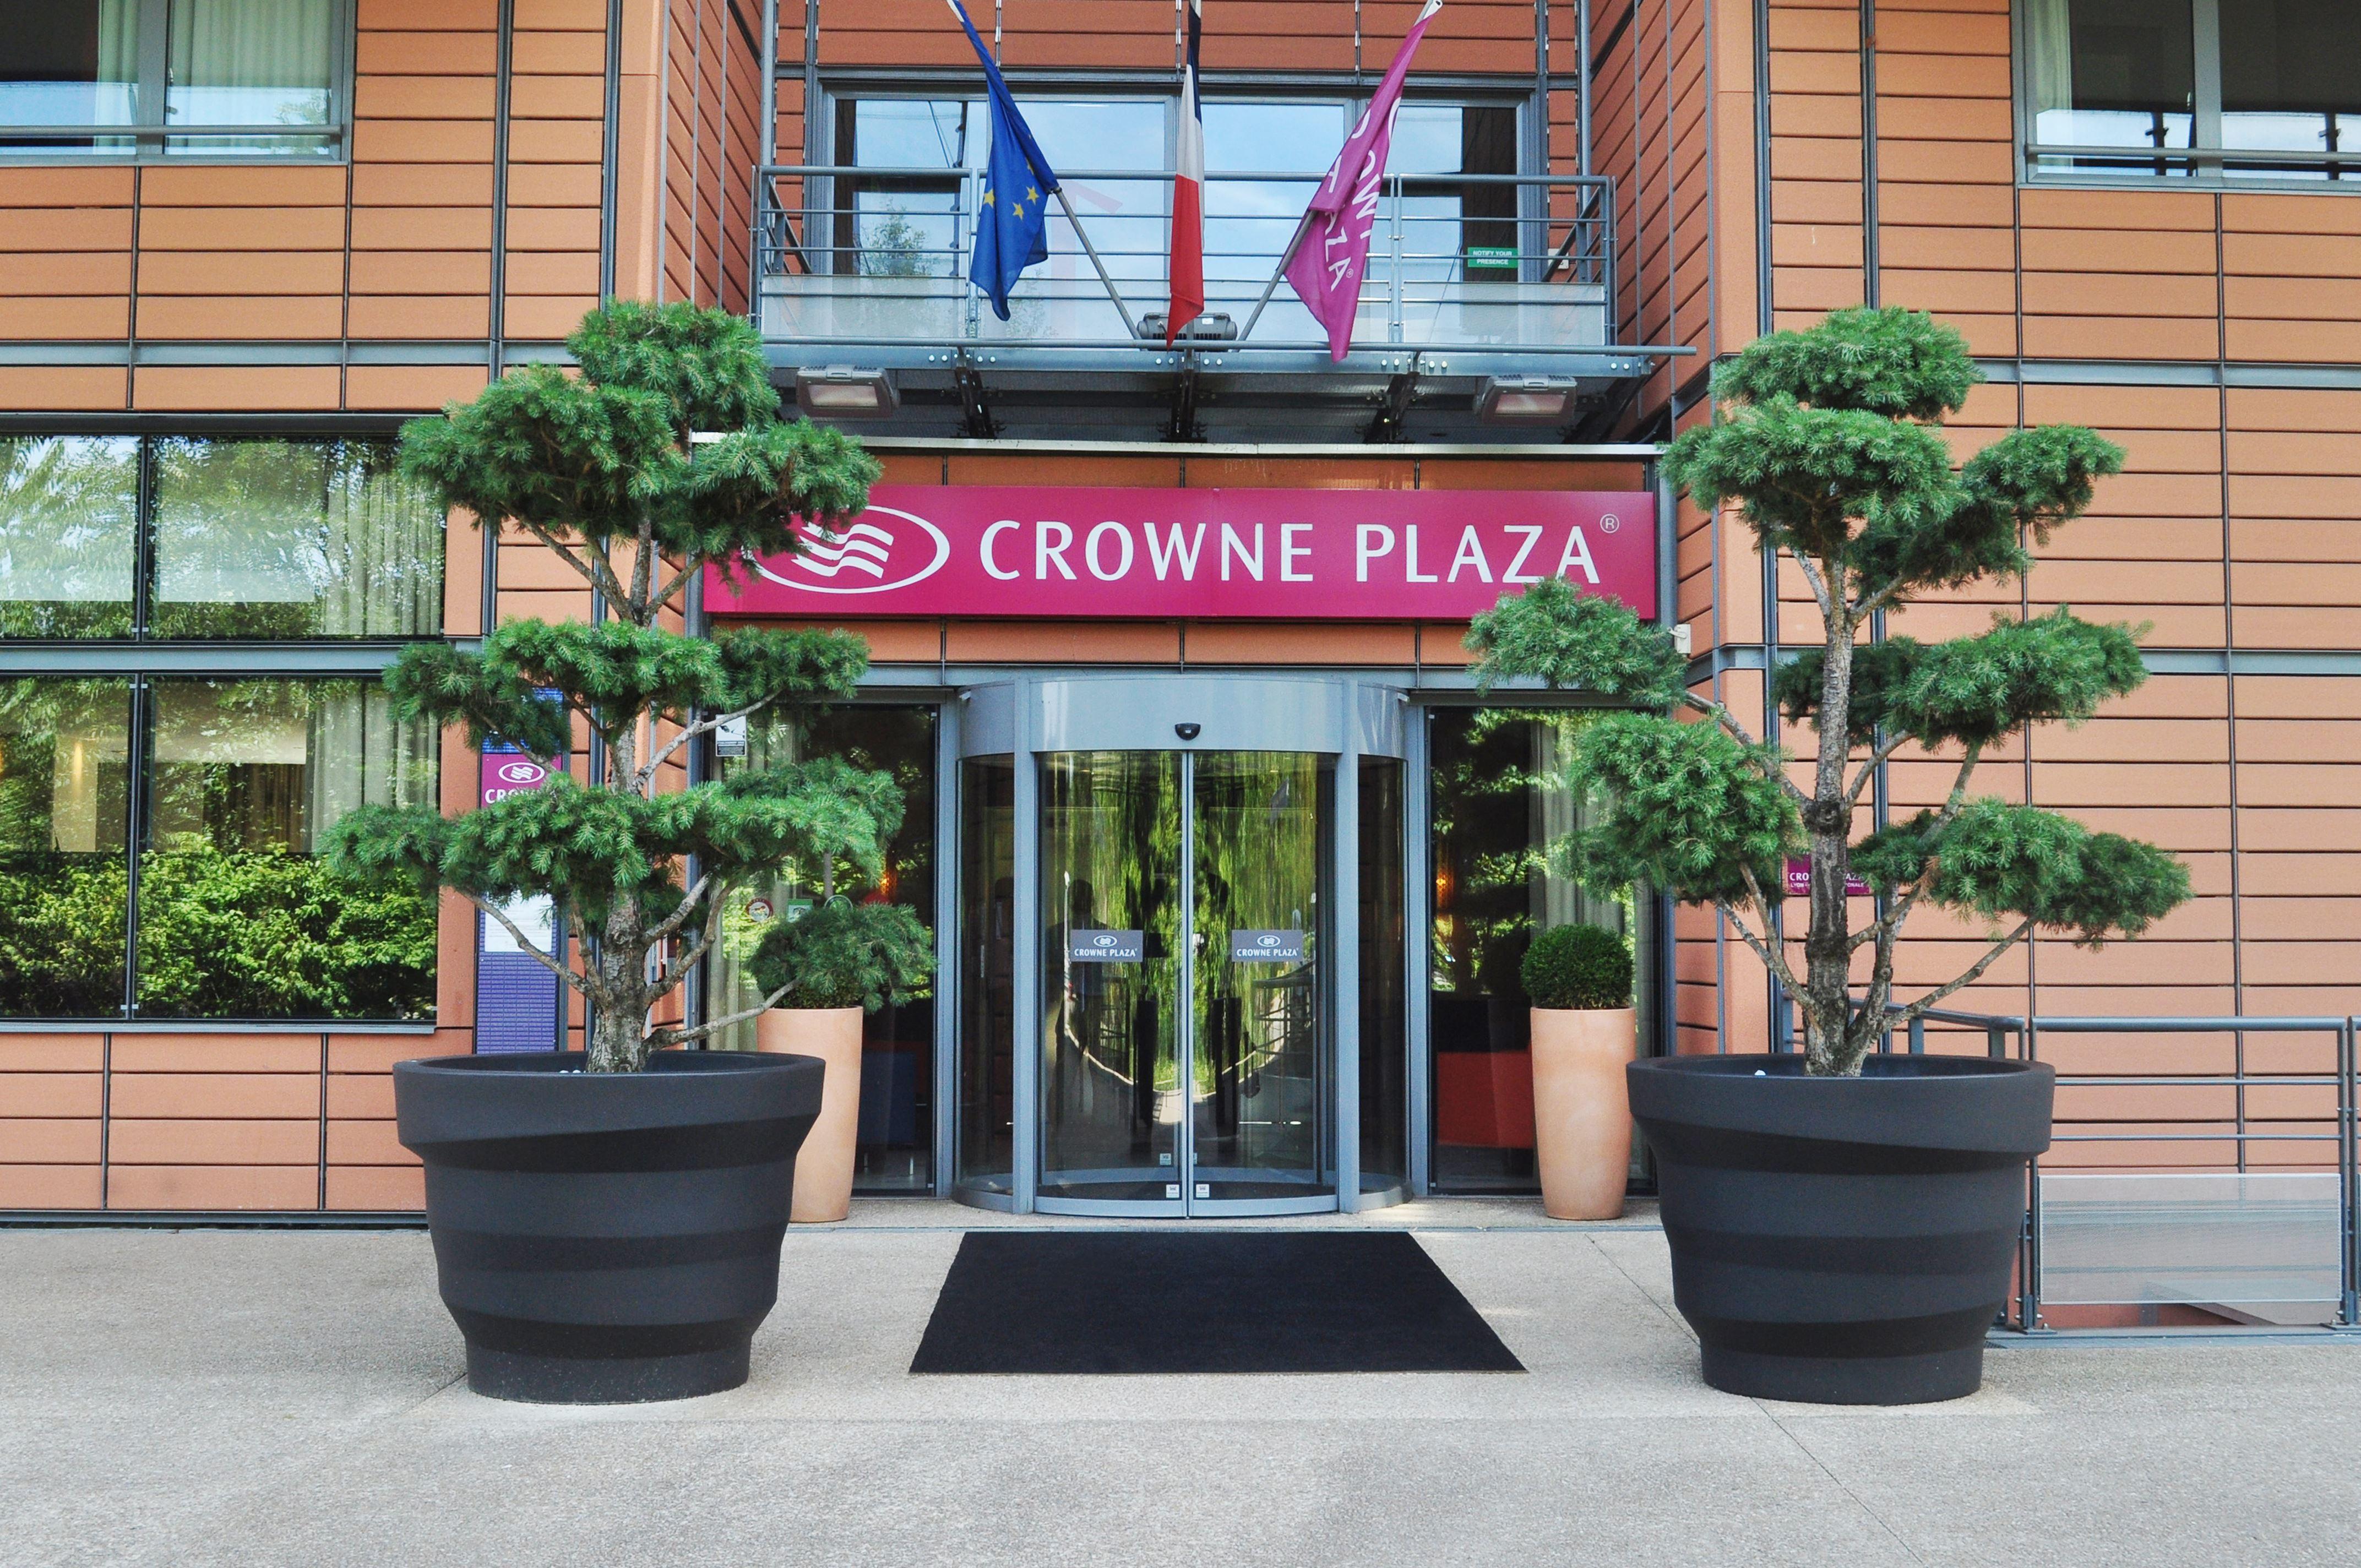 Crowne Plaza Lyon-Cite Internationale